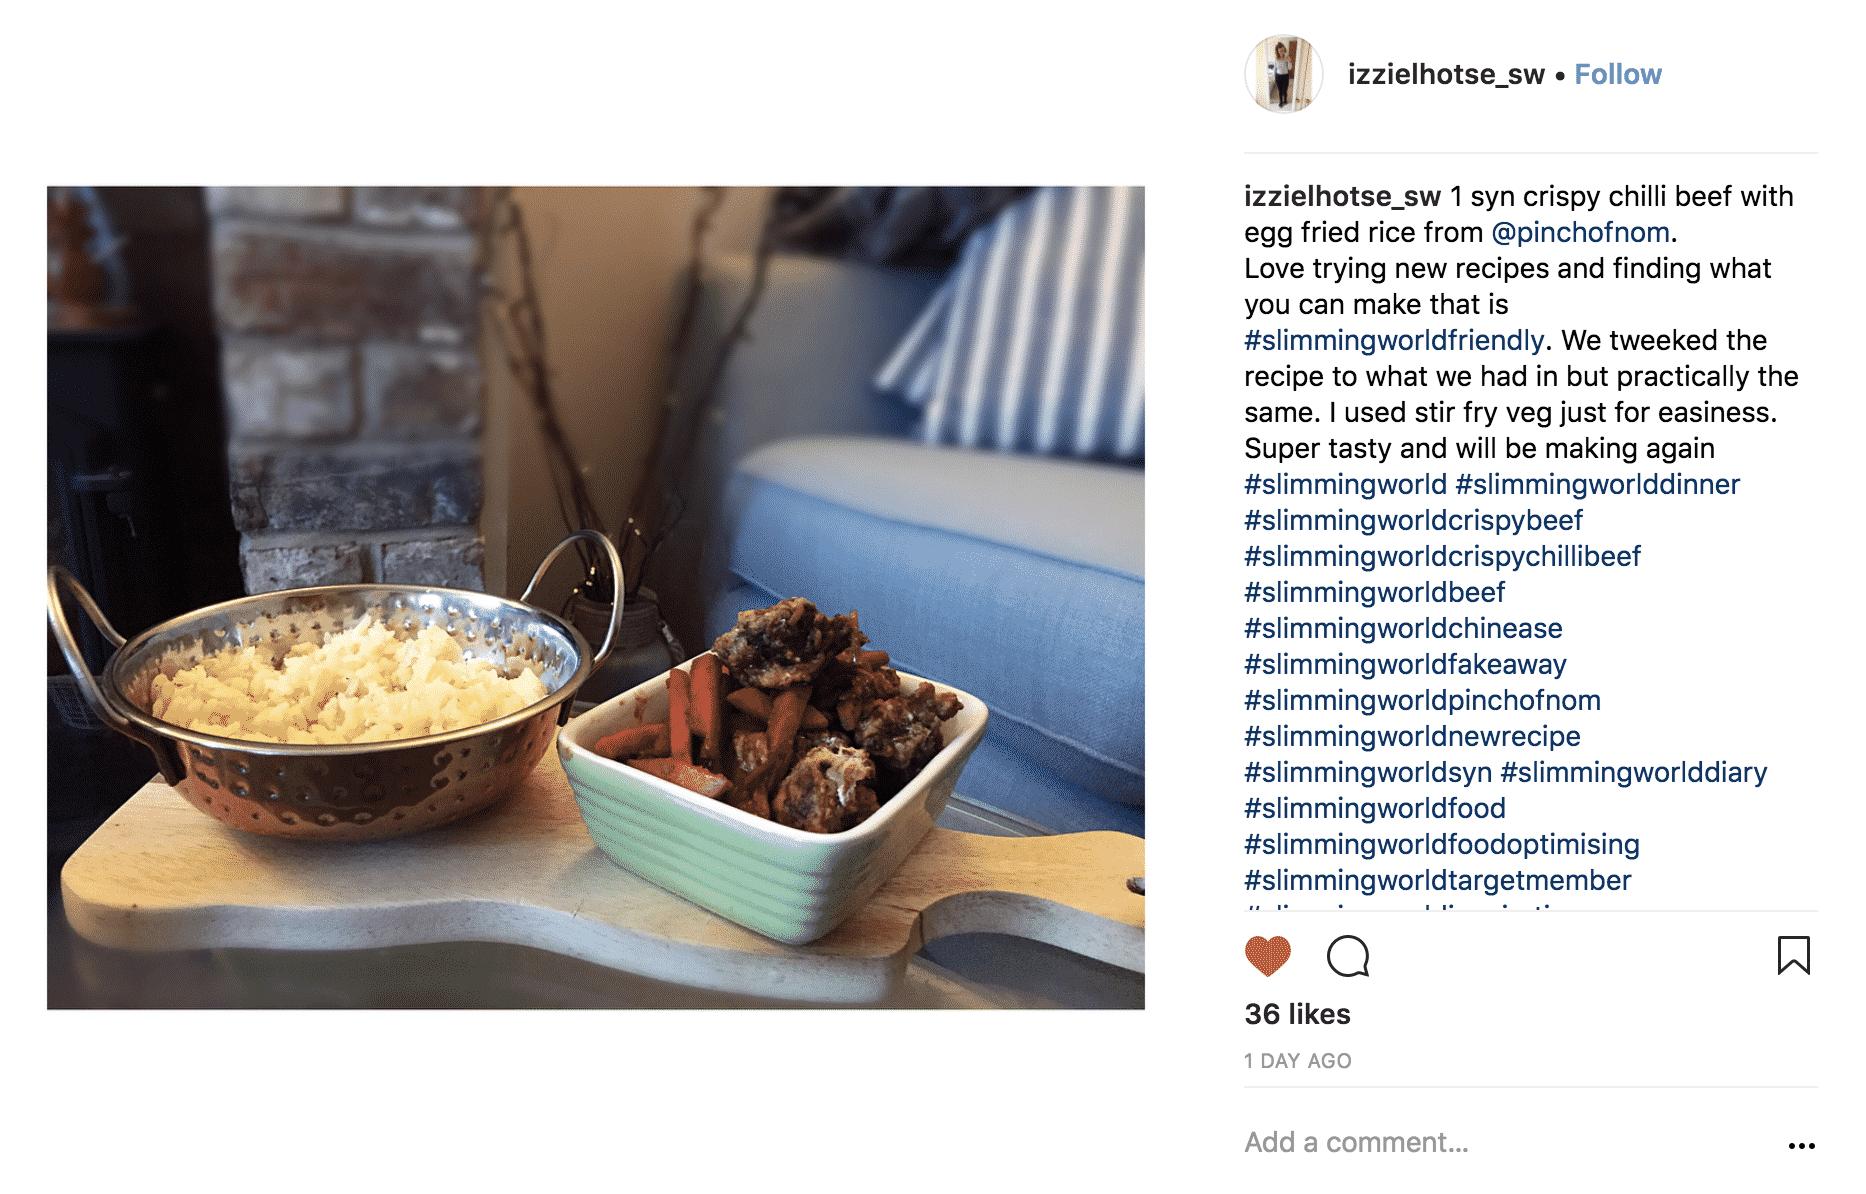 crispy chilli beef-izzielhotse_sw